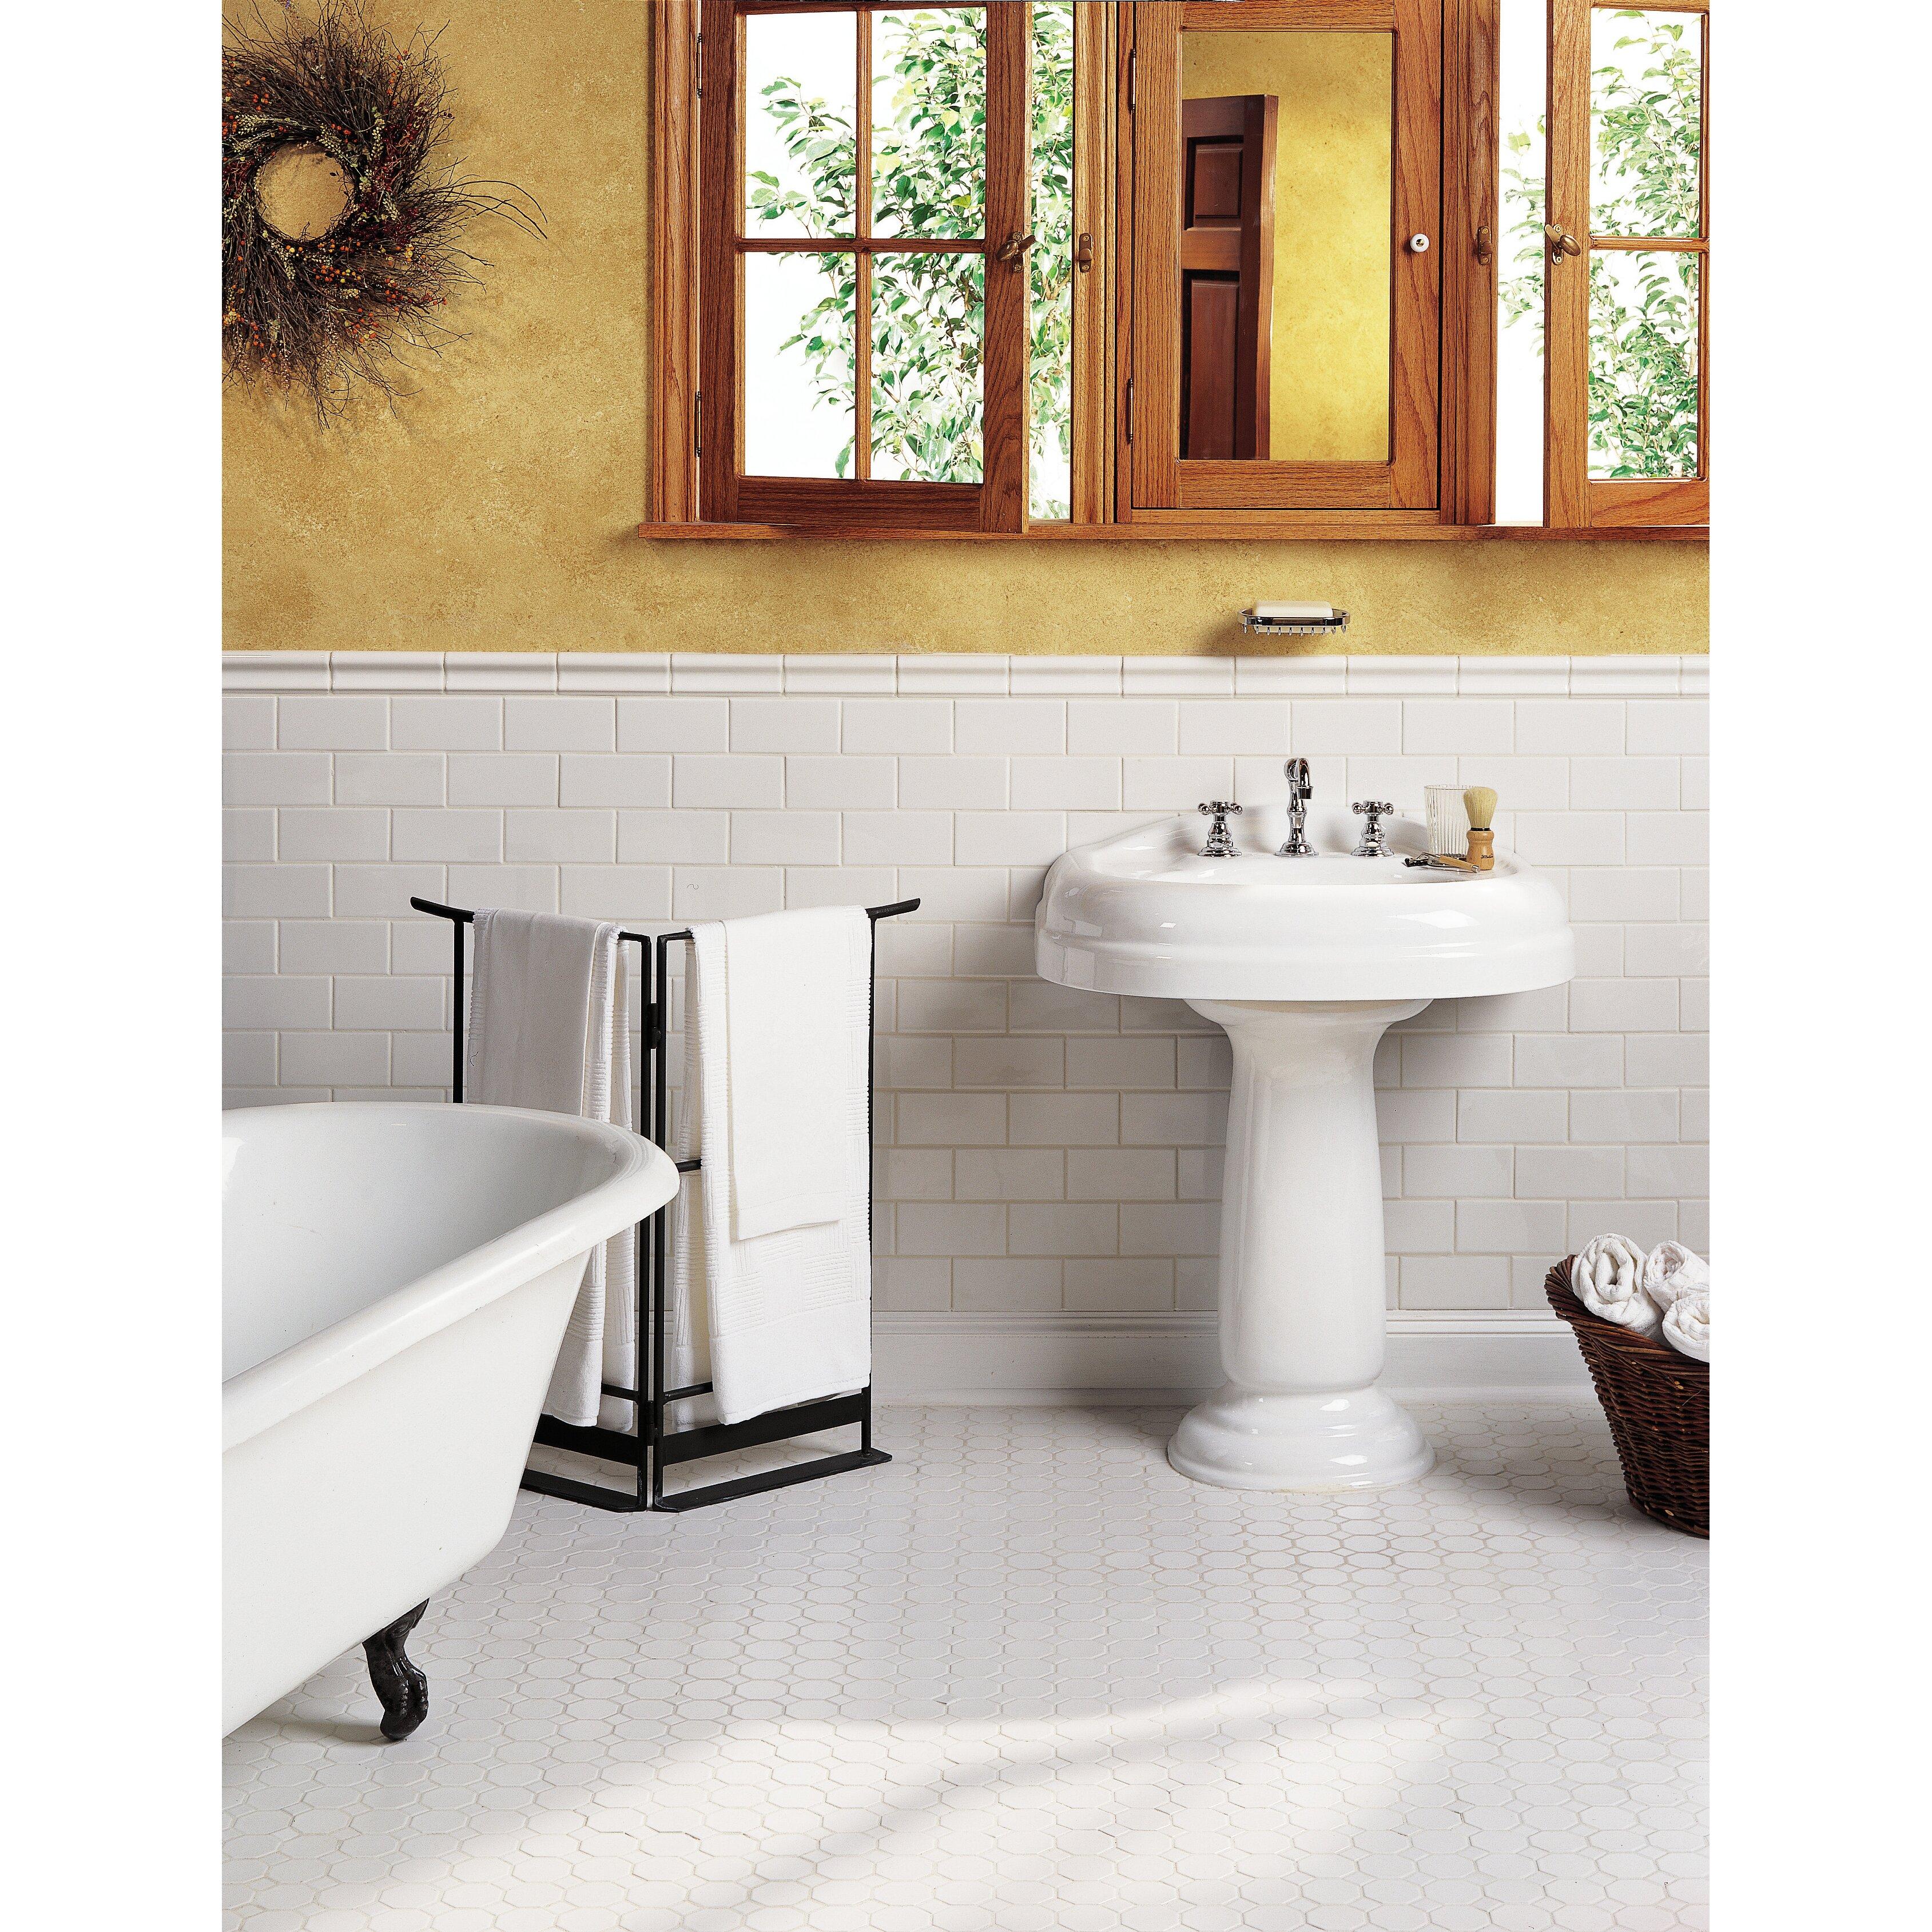 Daltile Bathroom Tile Daltile Octagon And Dot 2 X 2 Ceramic Mosaic Tile In Glazed